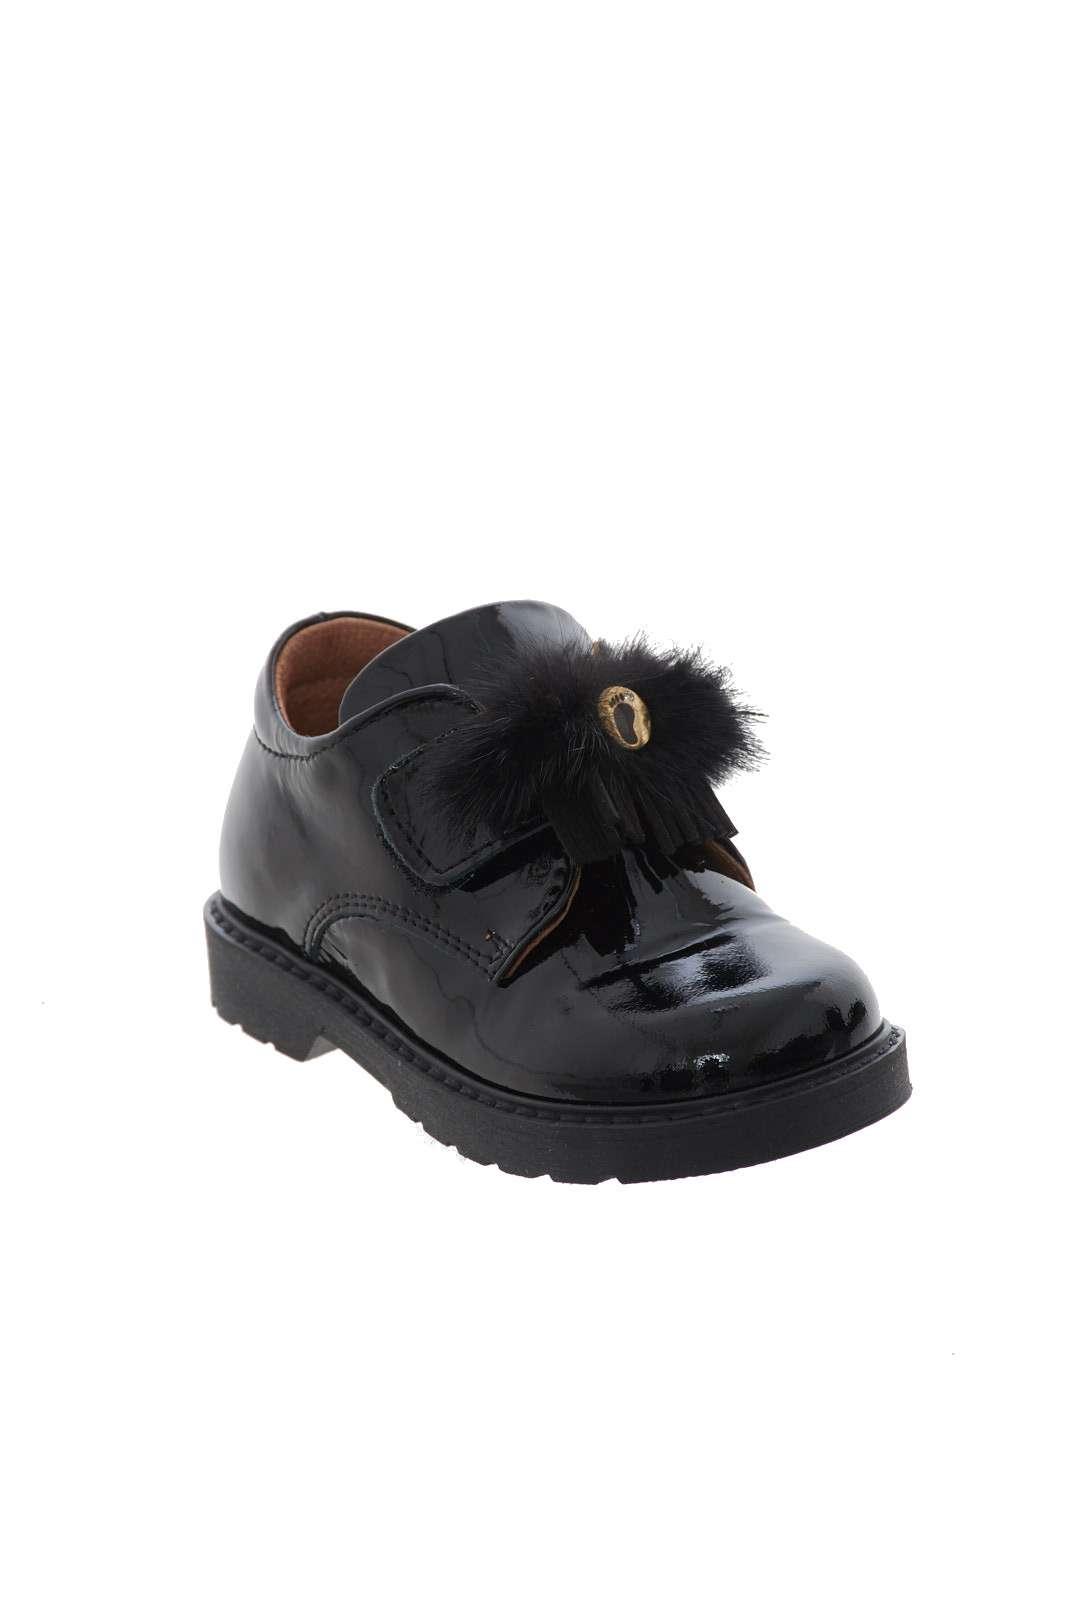 https://www.parmax.com/media/catalog/product/A/I/AI-outlet_parmax-scarpe-bambina-Walkey-Piccoli-Passi-Y1a40150-B.jpg